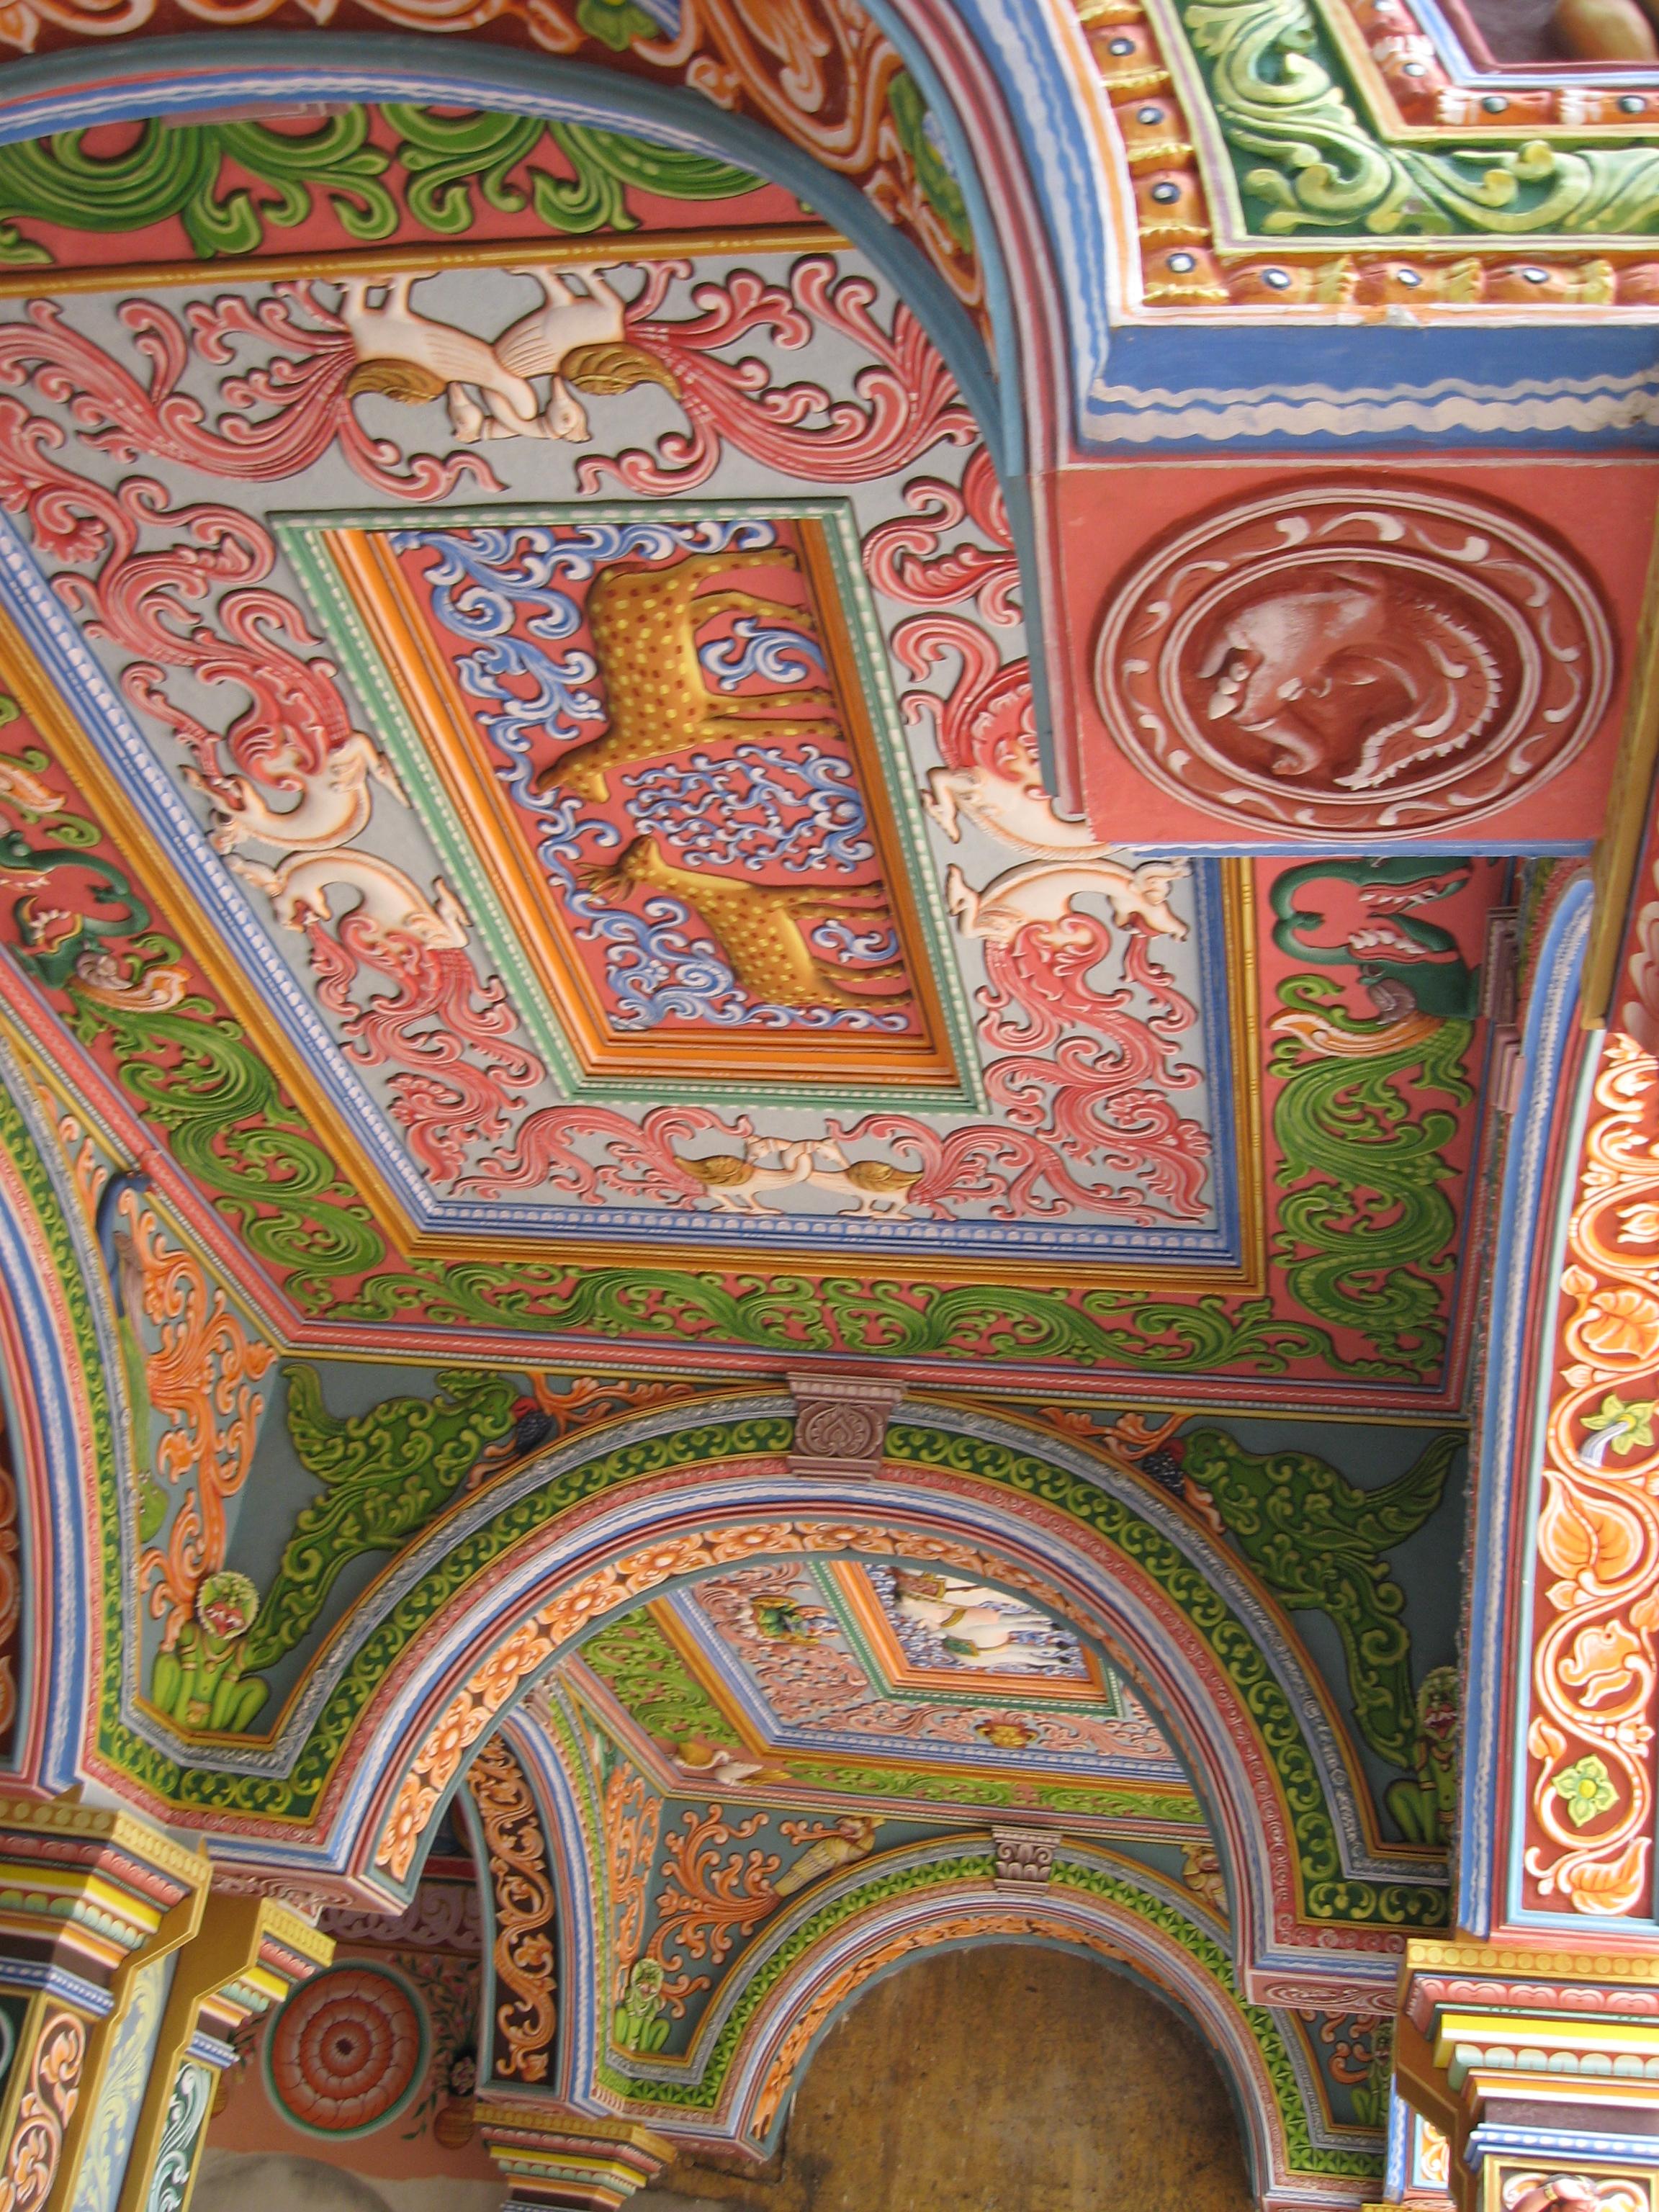 File:Near Saraswati Mahal Library - panoramio.jpg - Wikimedia Commons